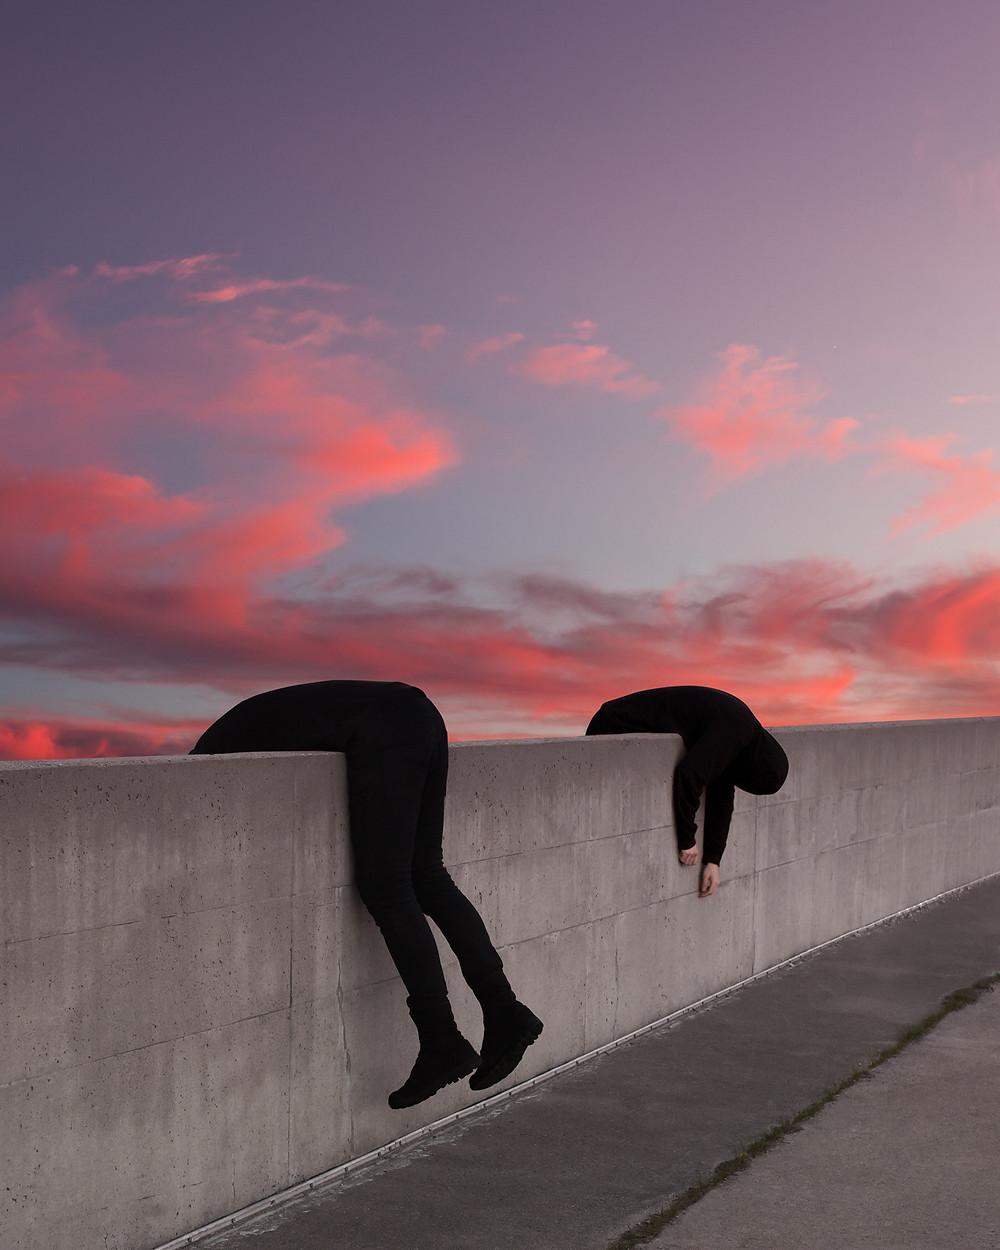 September Sunset 2018, (c) by Sean Mundy